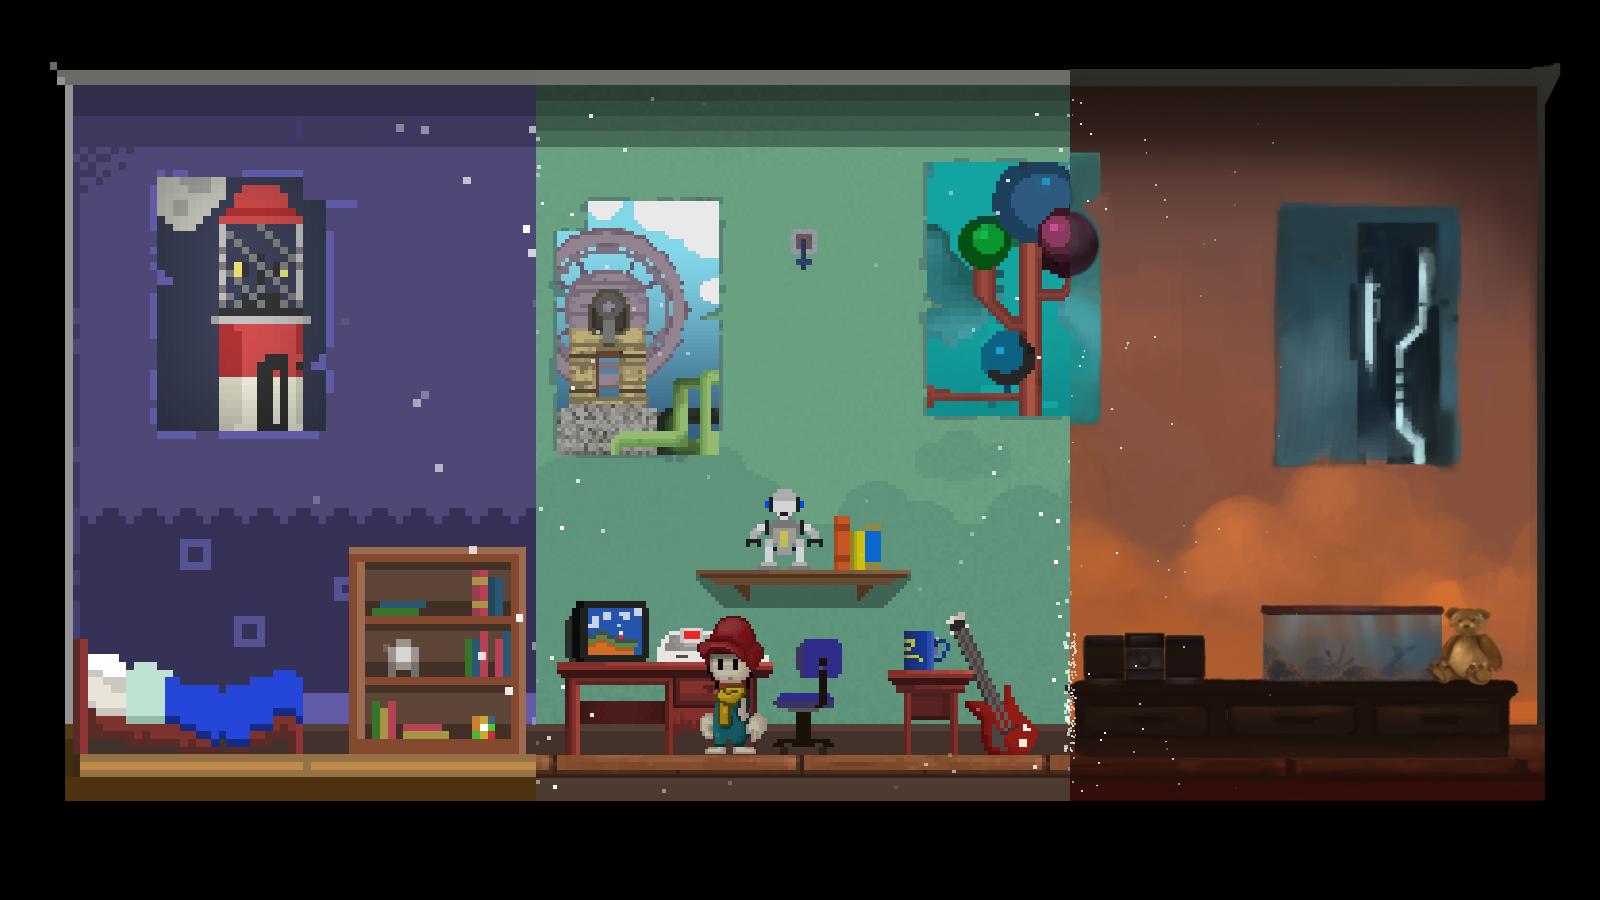 A Pixel Story Backgrounds, Compatible - PC, Mobile, Gadgets  1600x900 px